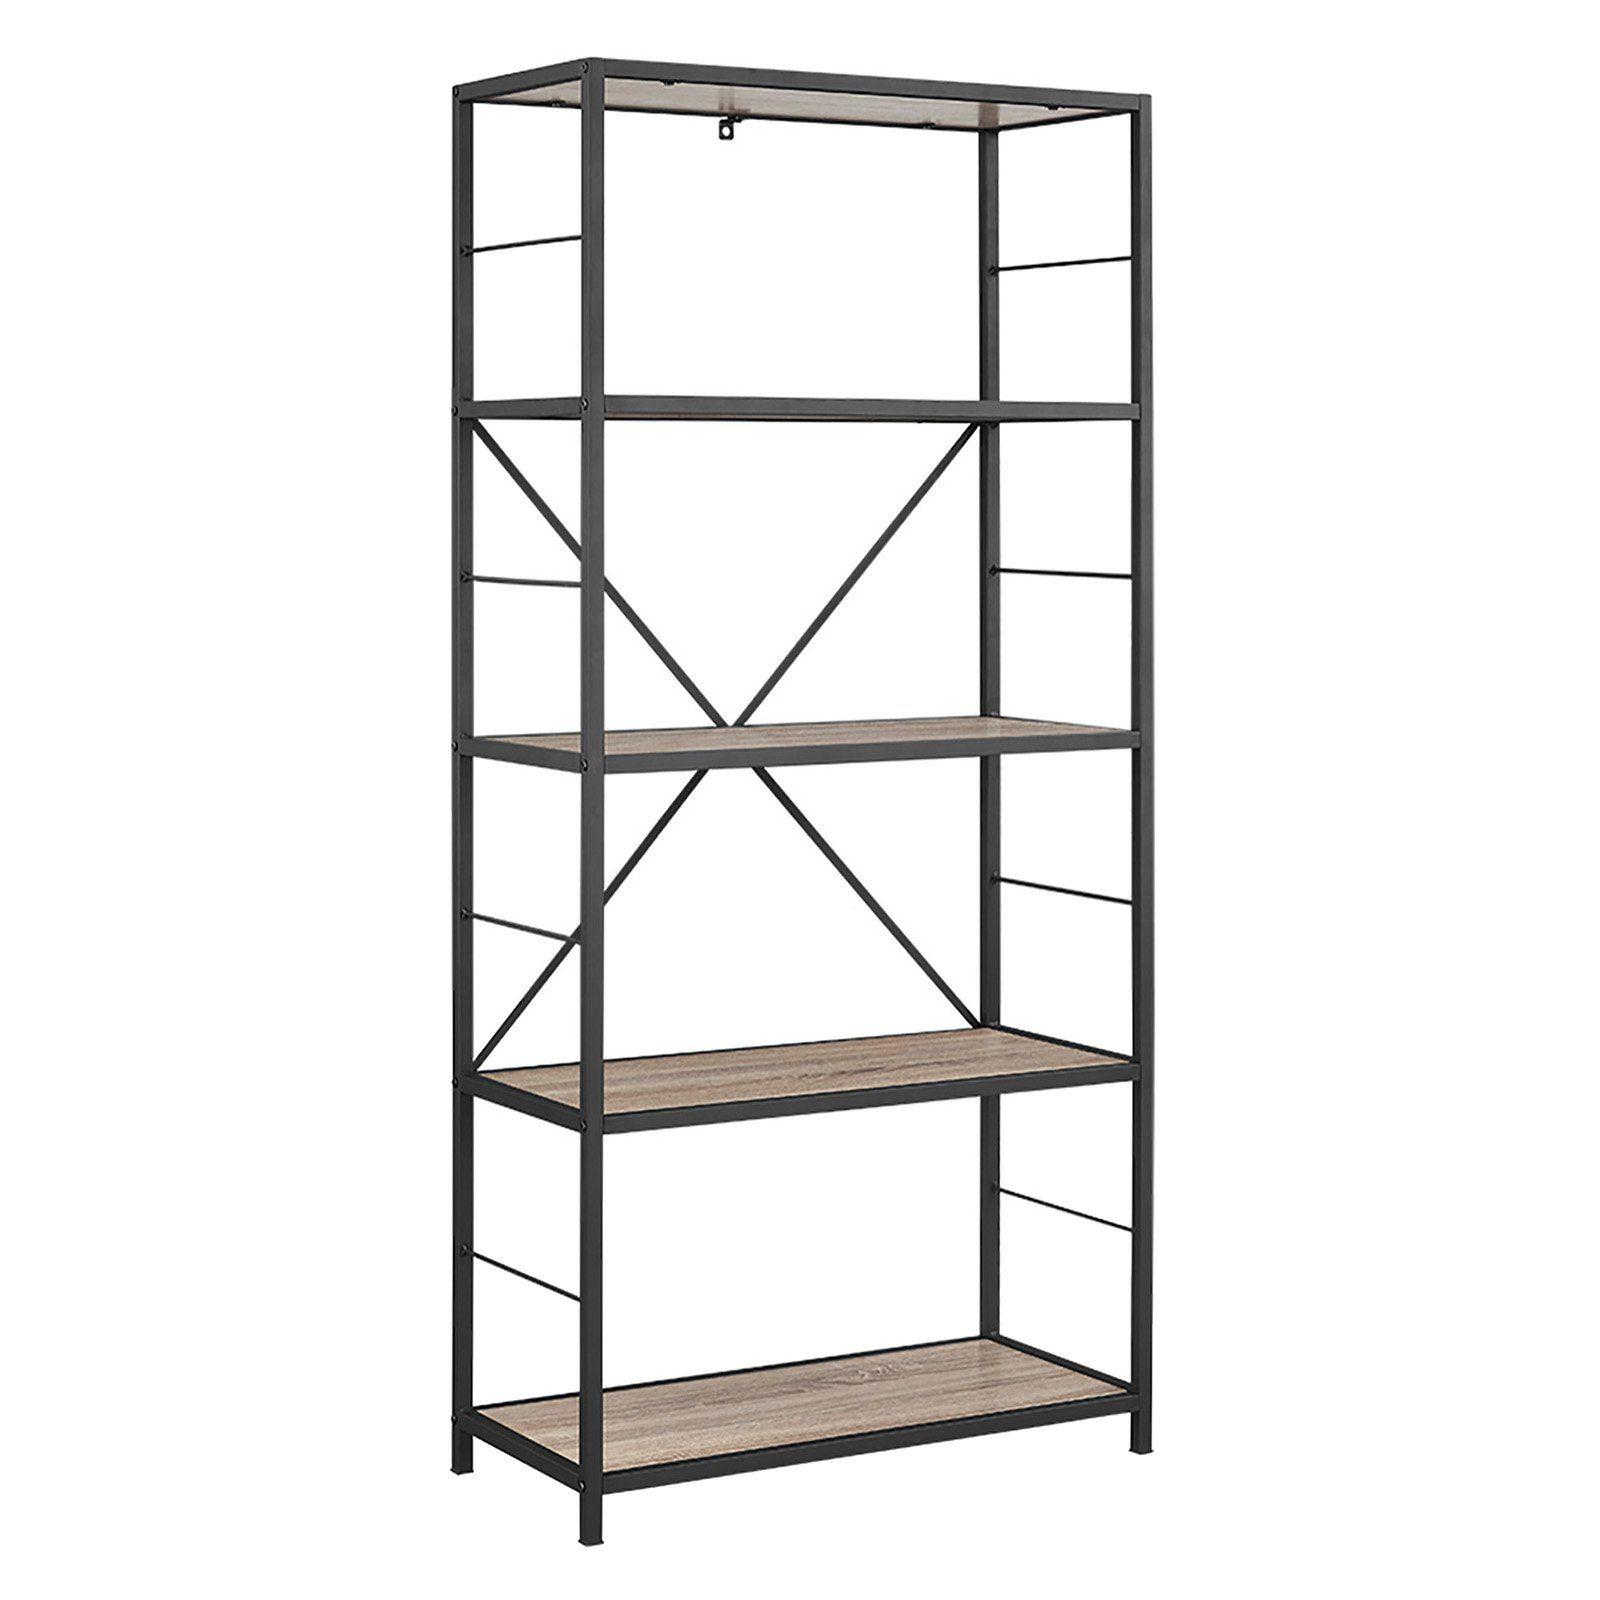 Walker Edison 60 In Rustic Media Bookshelf Products In 2019